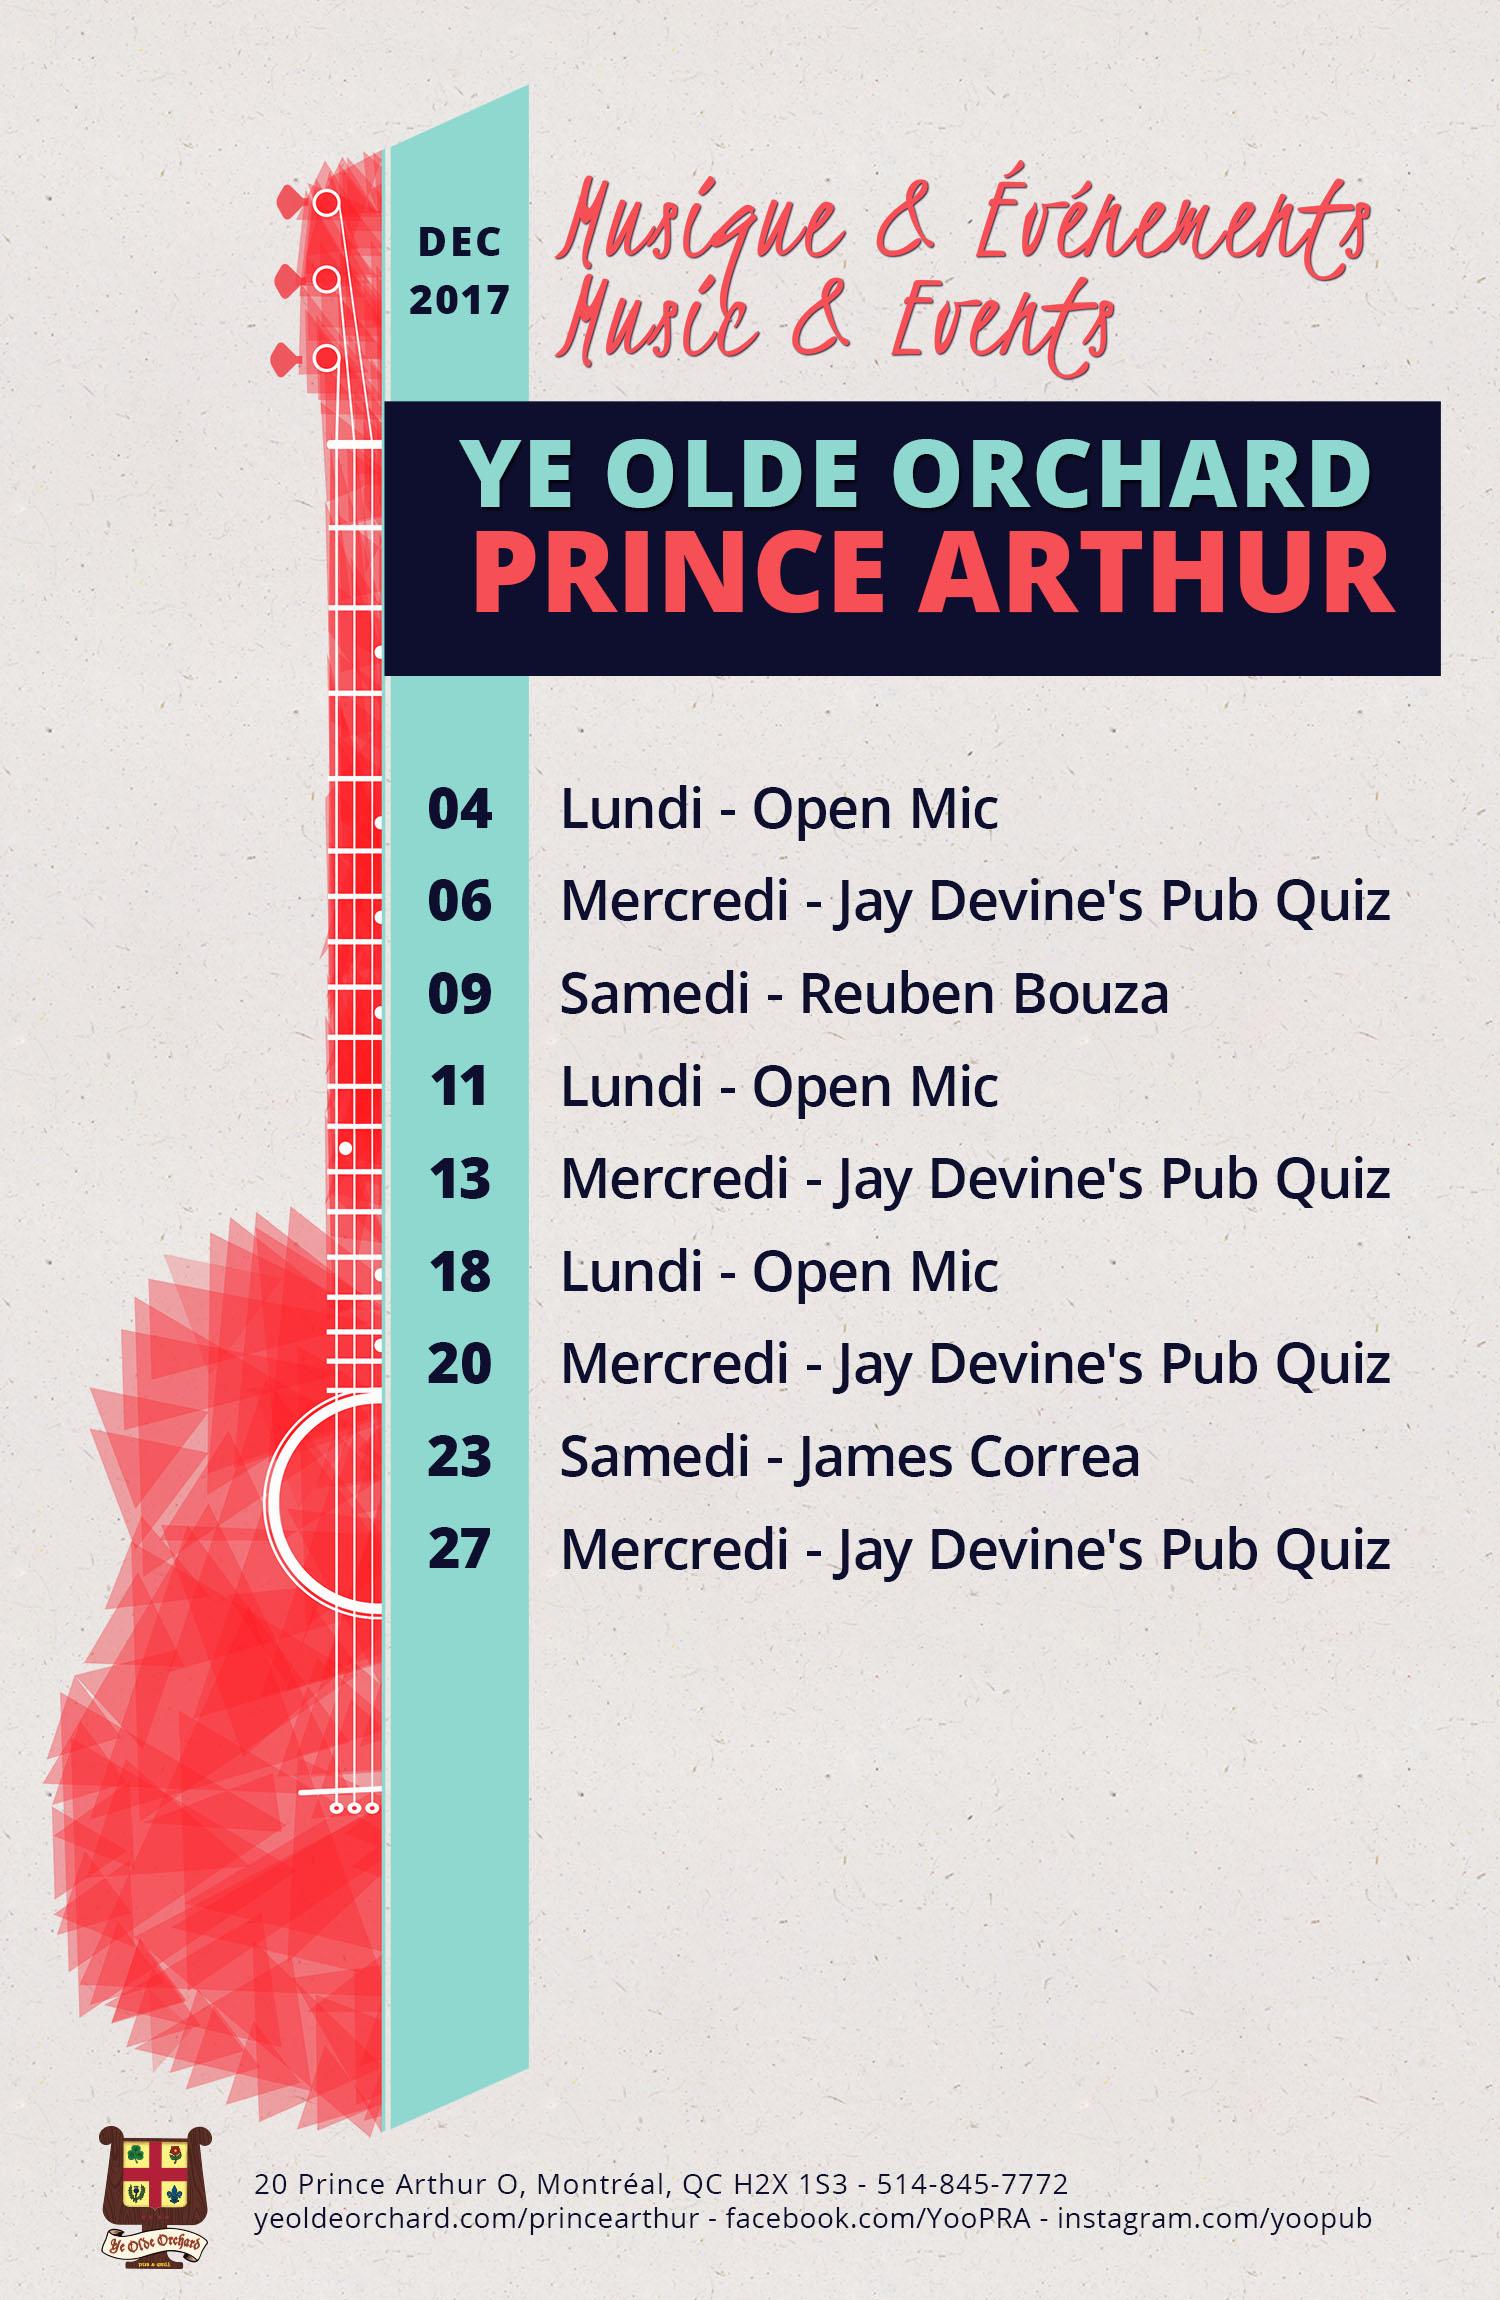 ye-olde-orchard-pub-music-and-events-calendar-prince-arthur-DEC-WEB